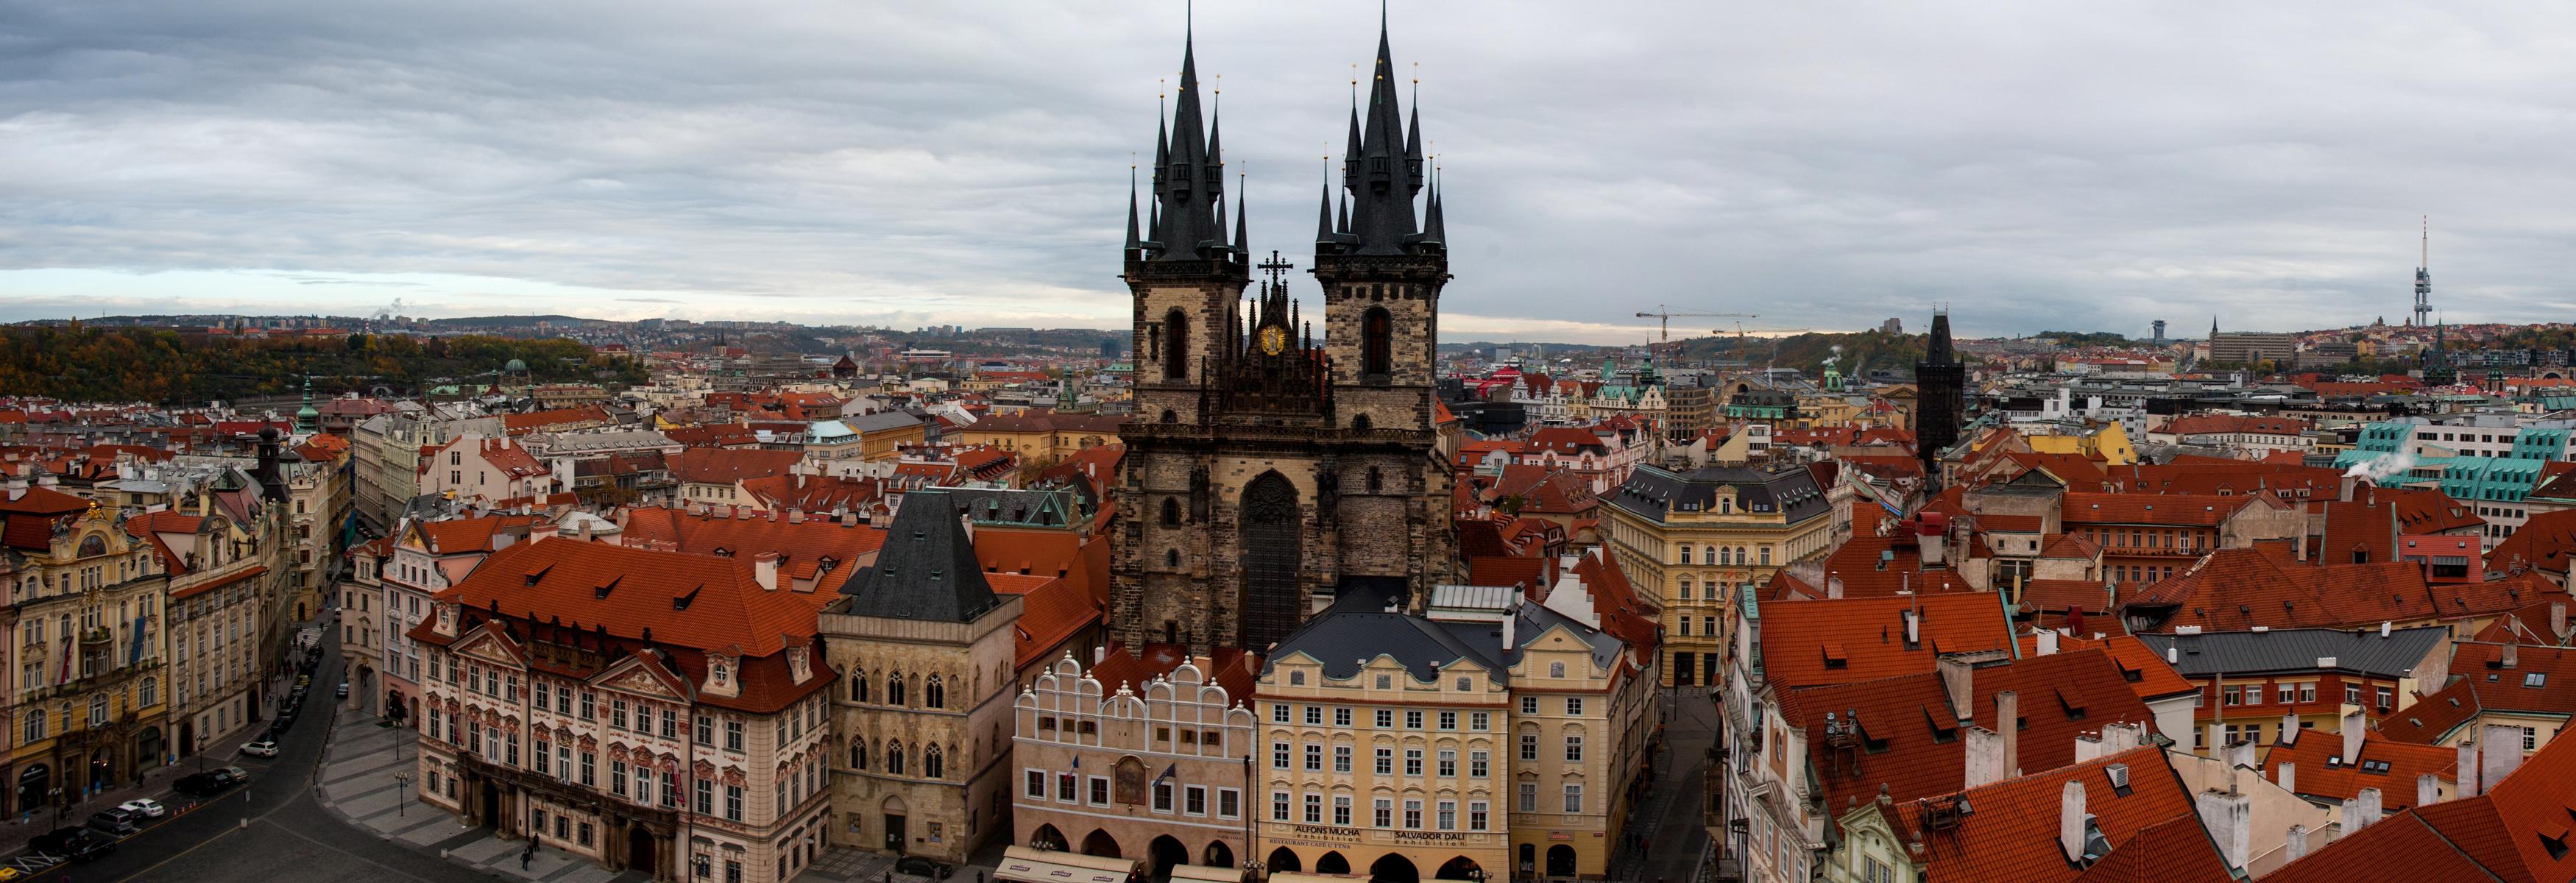 25cd1c7e5 File:Panoramic view of Prague. Czech Republic, Western Europe. October 24,